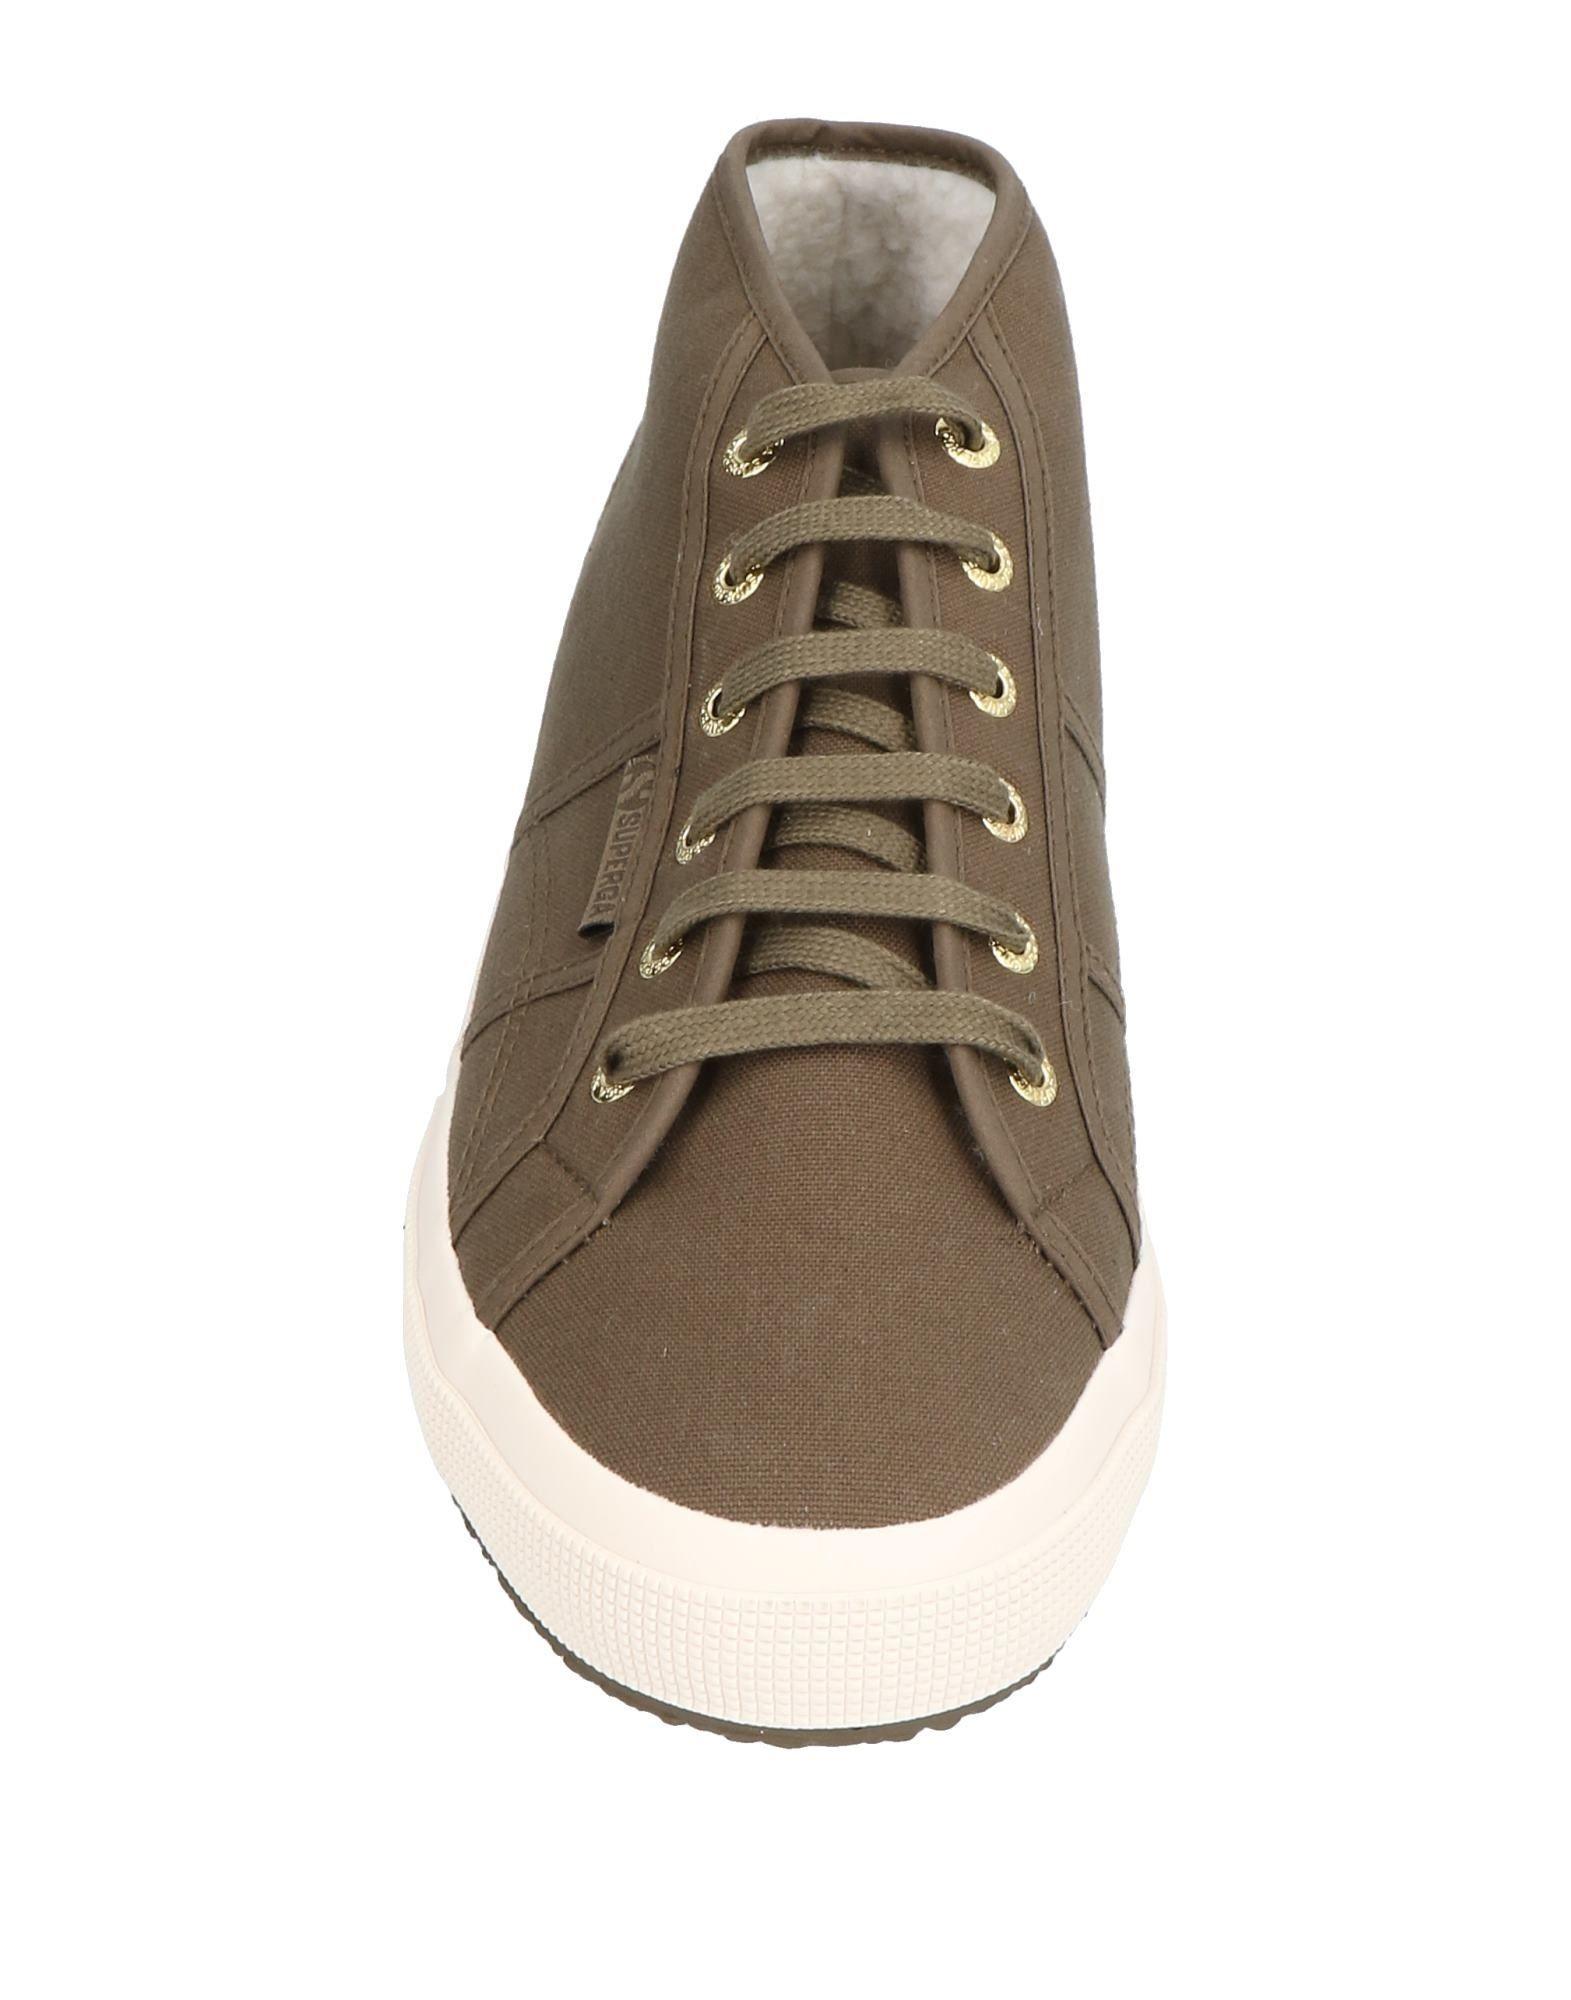 Superga Military Green Cotton Canvas Sneakers